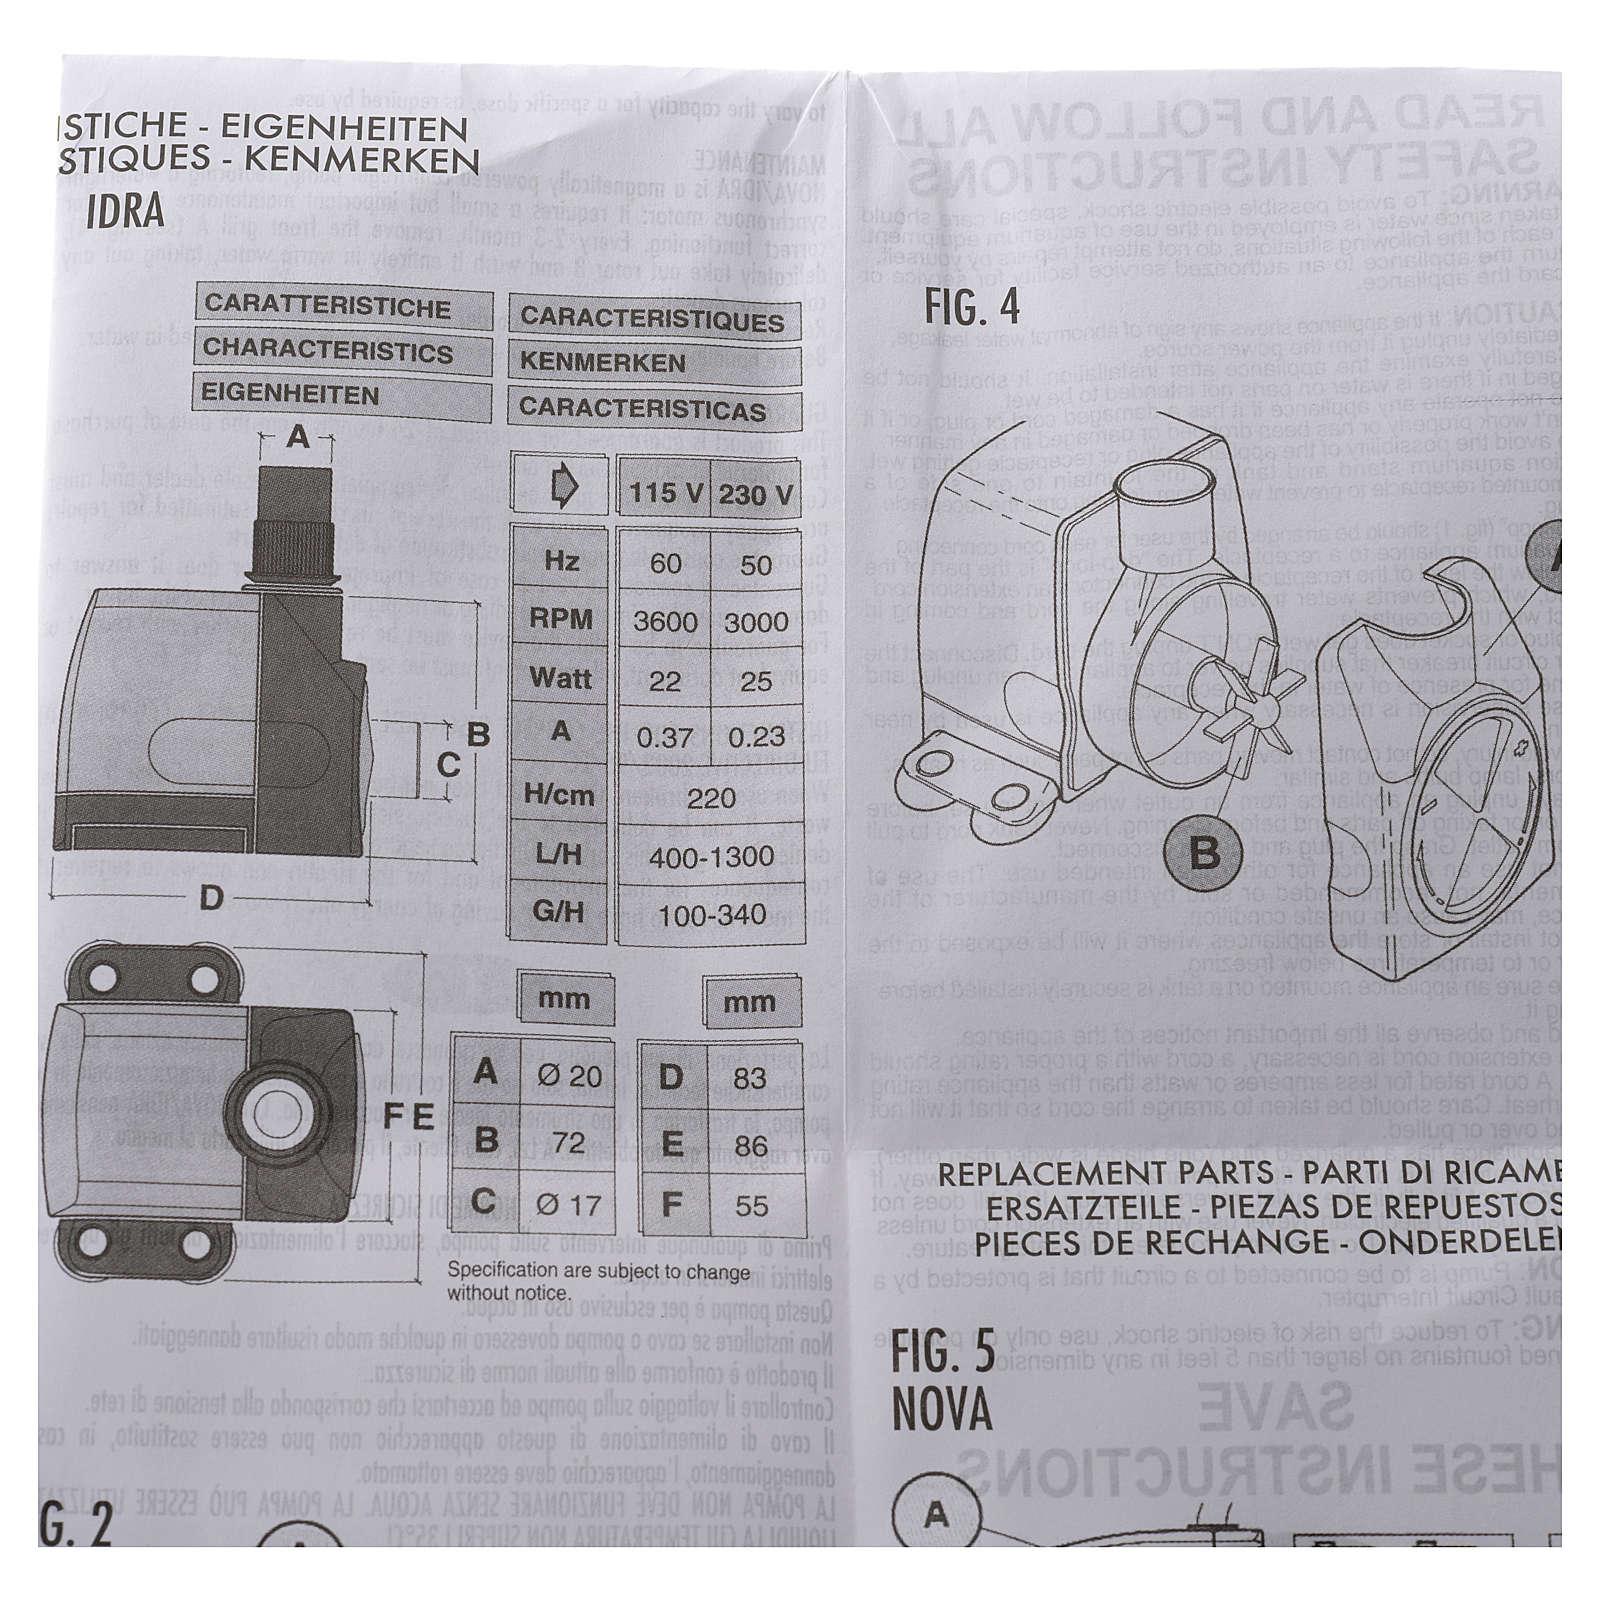 Pompa acqua presepe IDRA 400-1300 litri/ora 25w 4